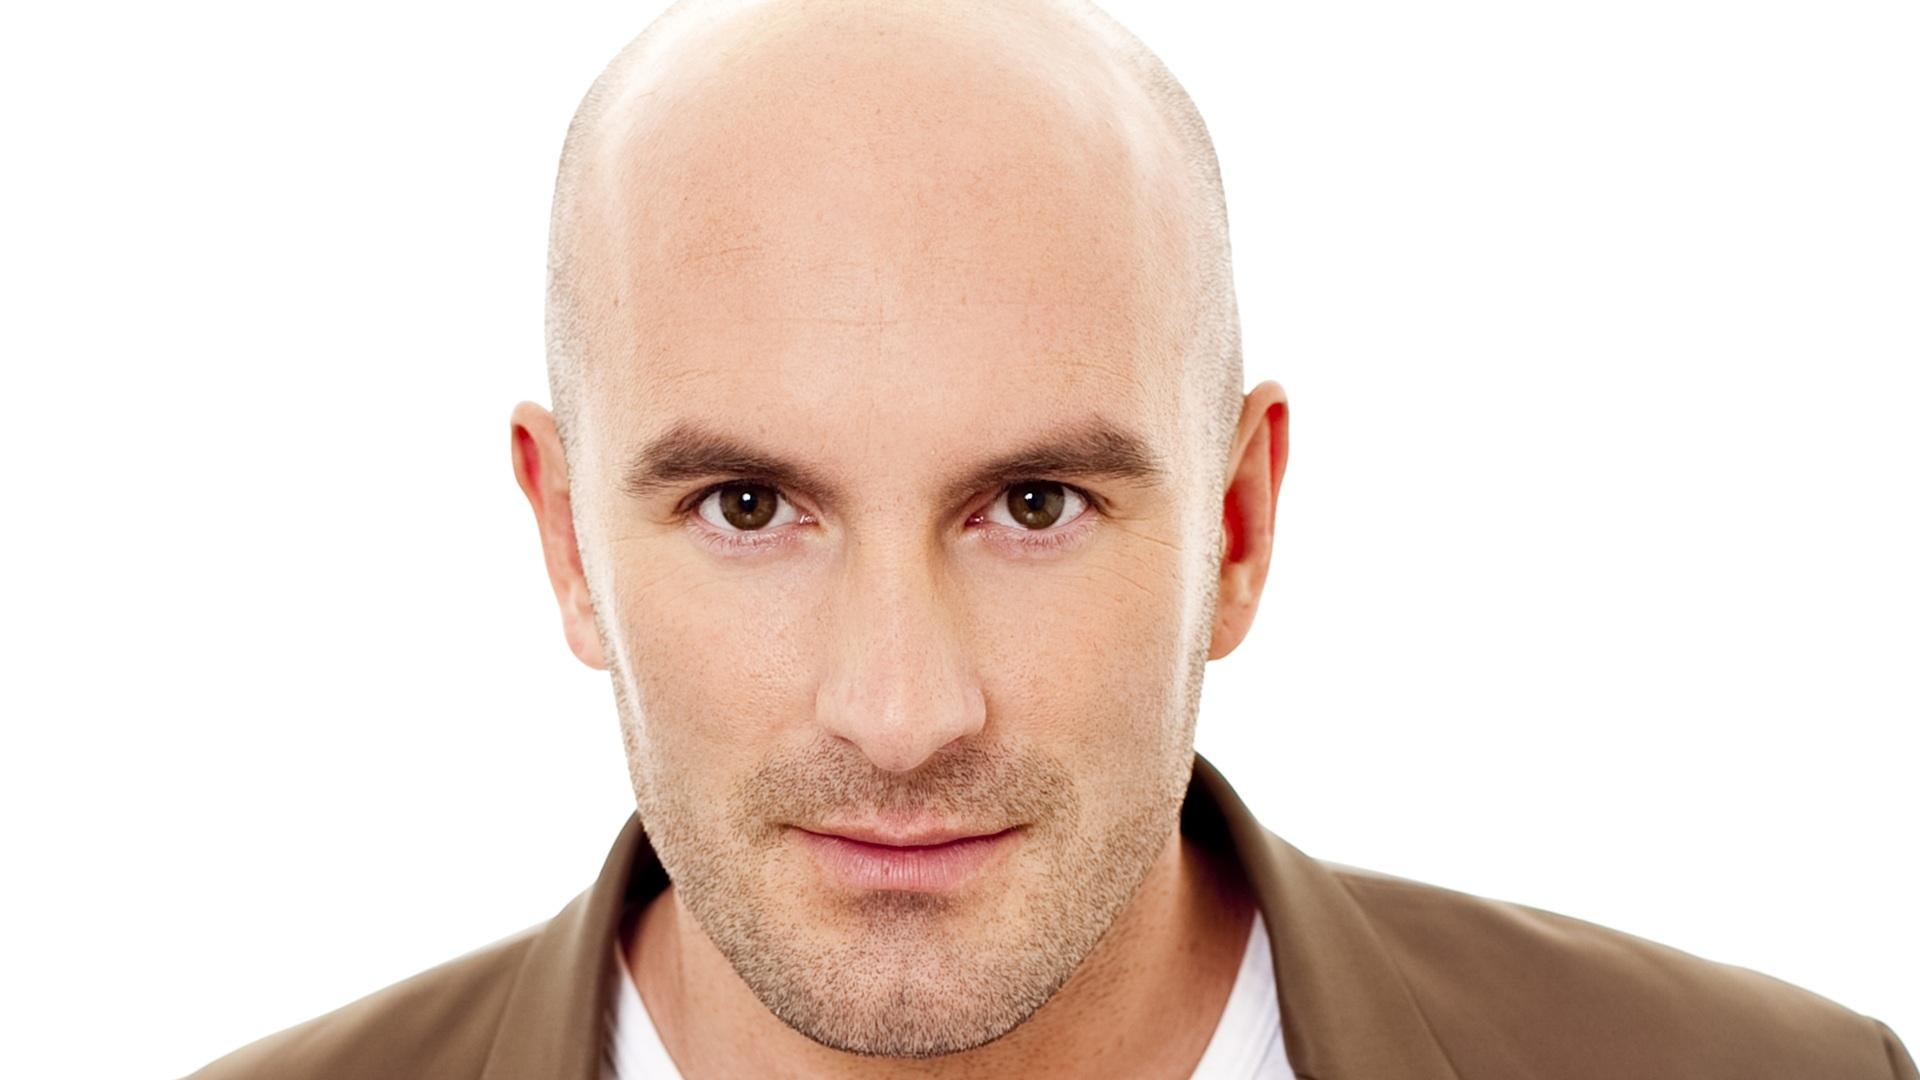 Фото голова мужика без лица особенности модели